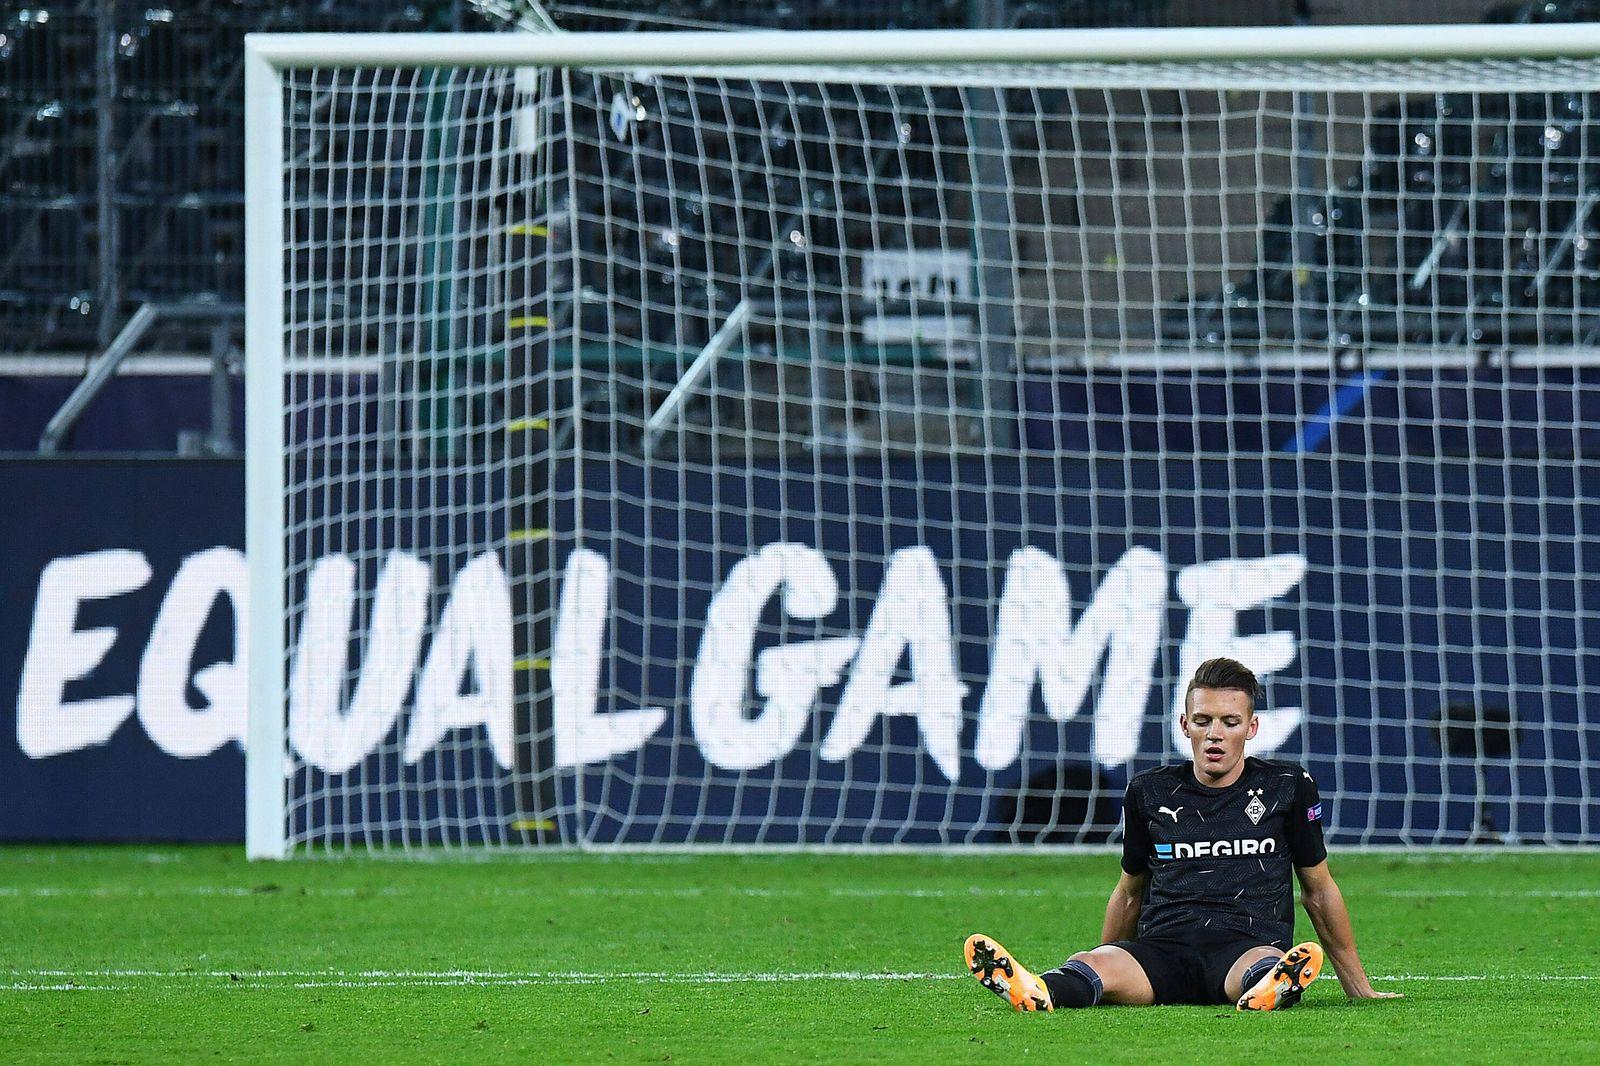 Fußball Champions League Gruppenphase 2. Spieltag Borussia Mönchengladbach - Real Madrid am 27.10.2020 im Borussia-Park